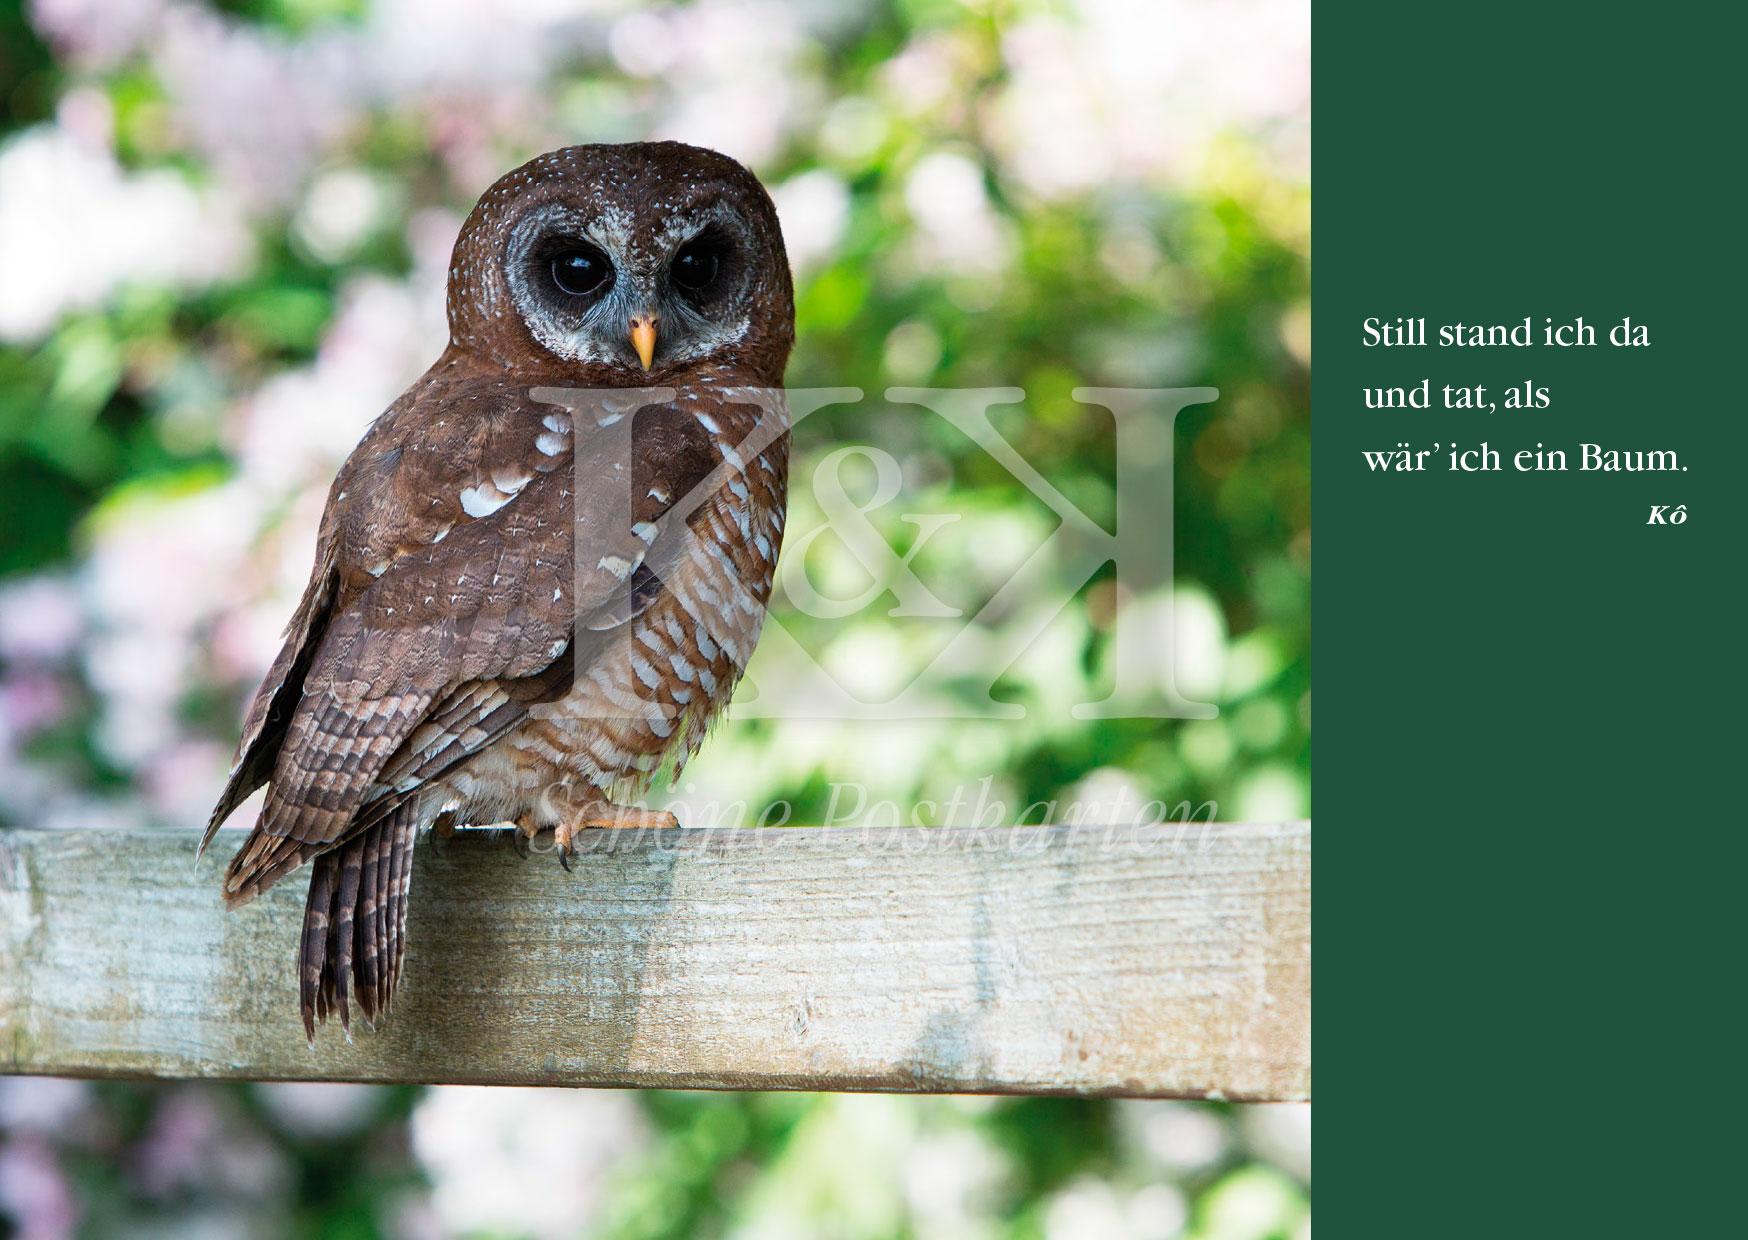 <strong>Schöne Postkarte Nr. 102</strong> · Kô: Haiku mit Kauz © 2018